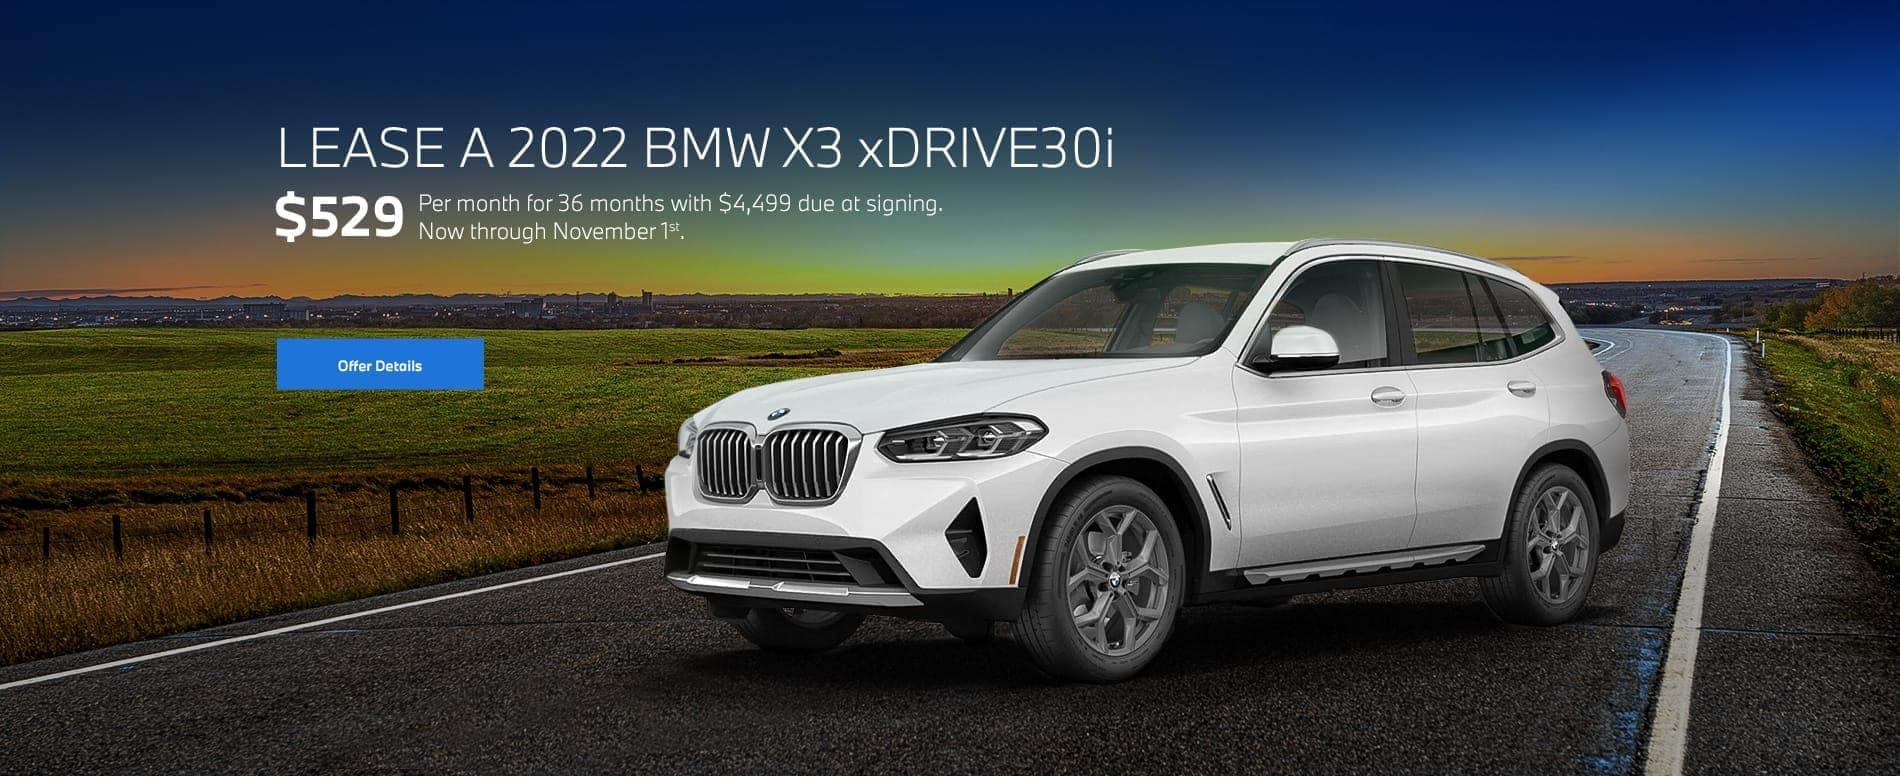 BMW_2022_X3_xDrive30i_529_1900x776_Desktop